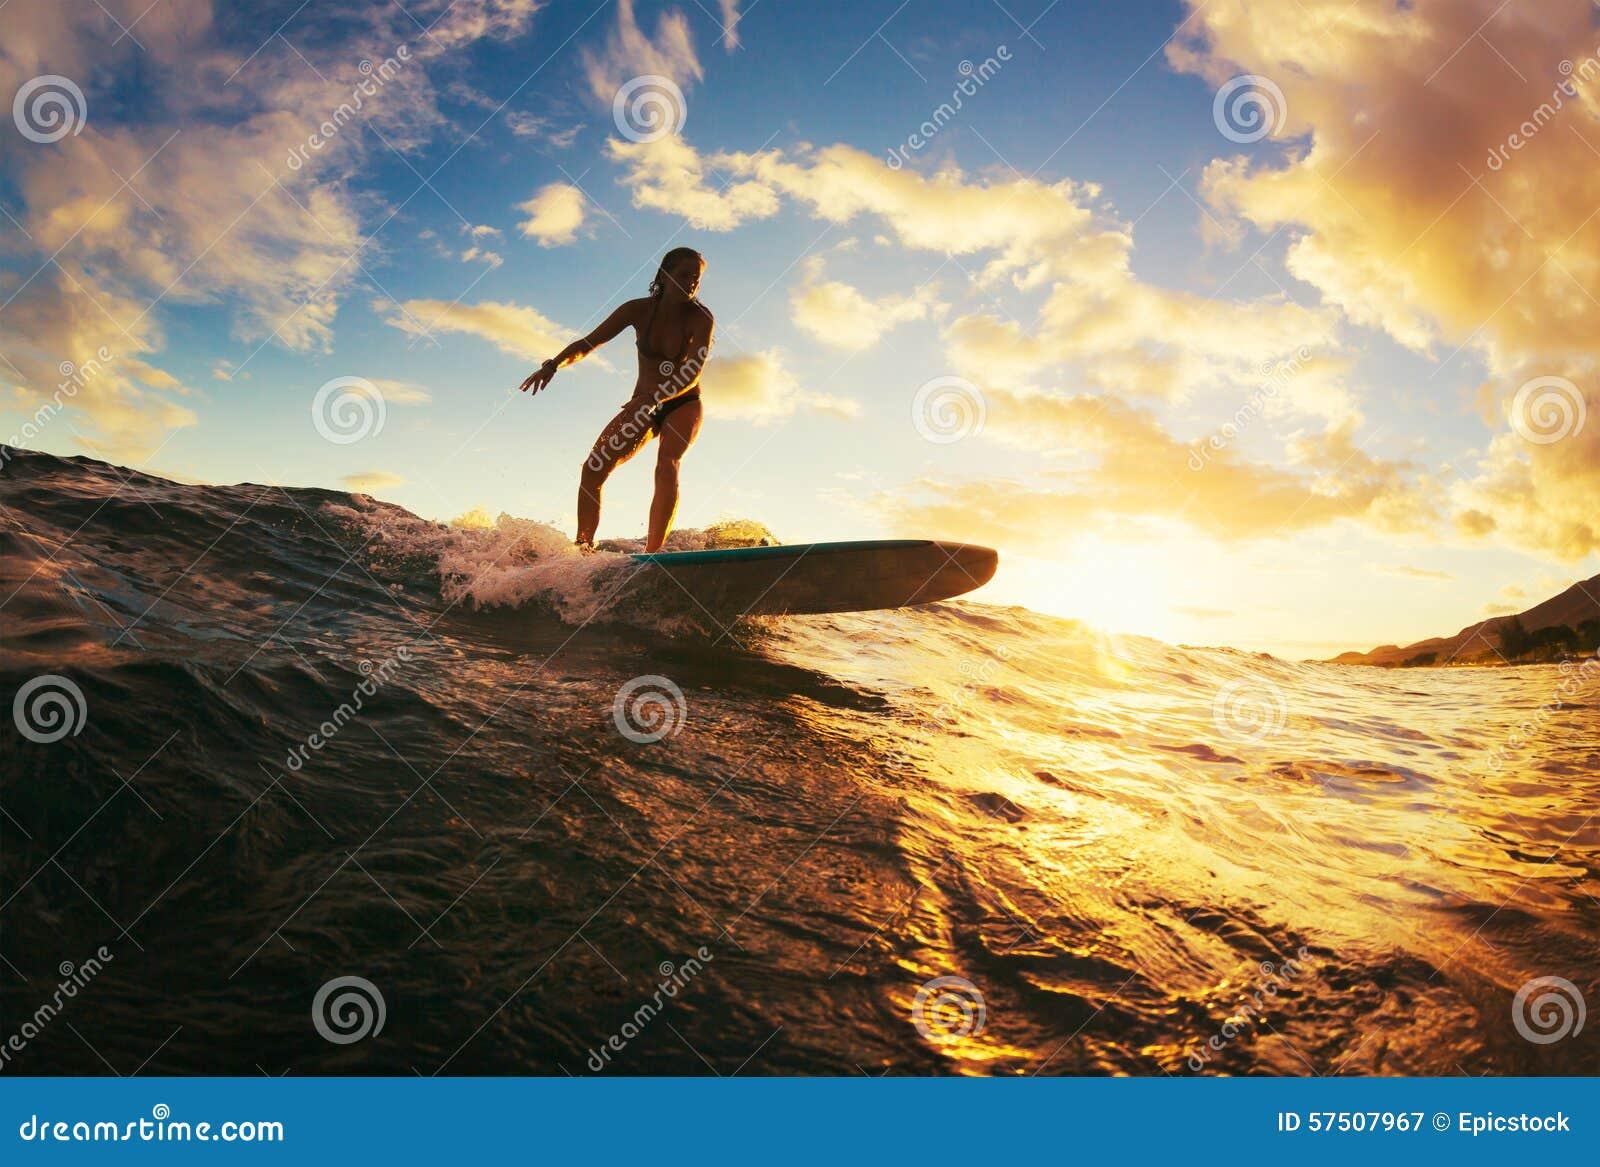 Surfen am Sonnenuntergang